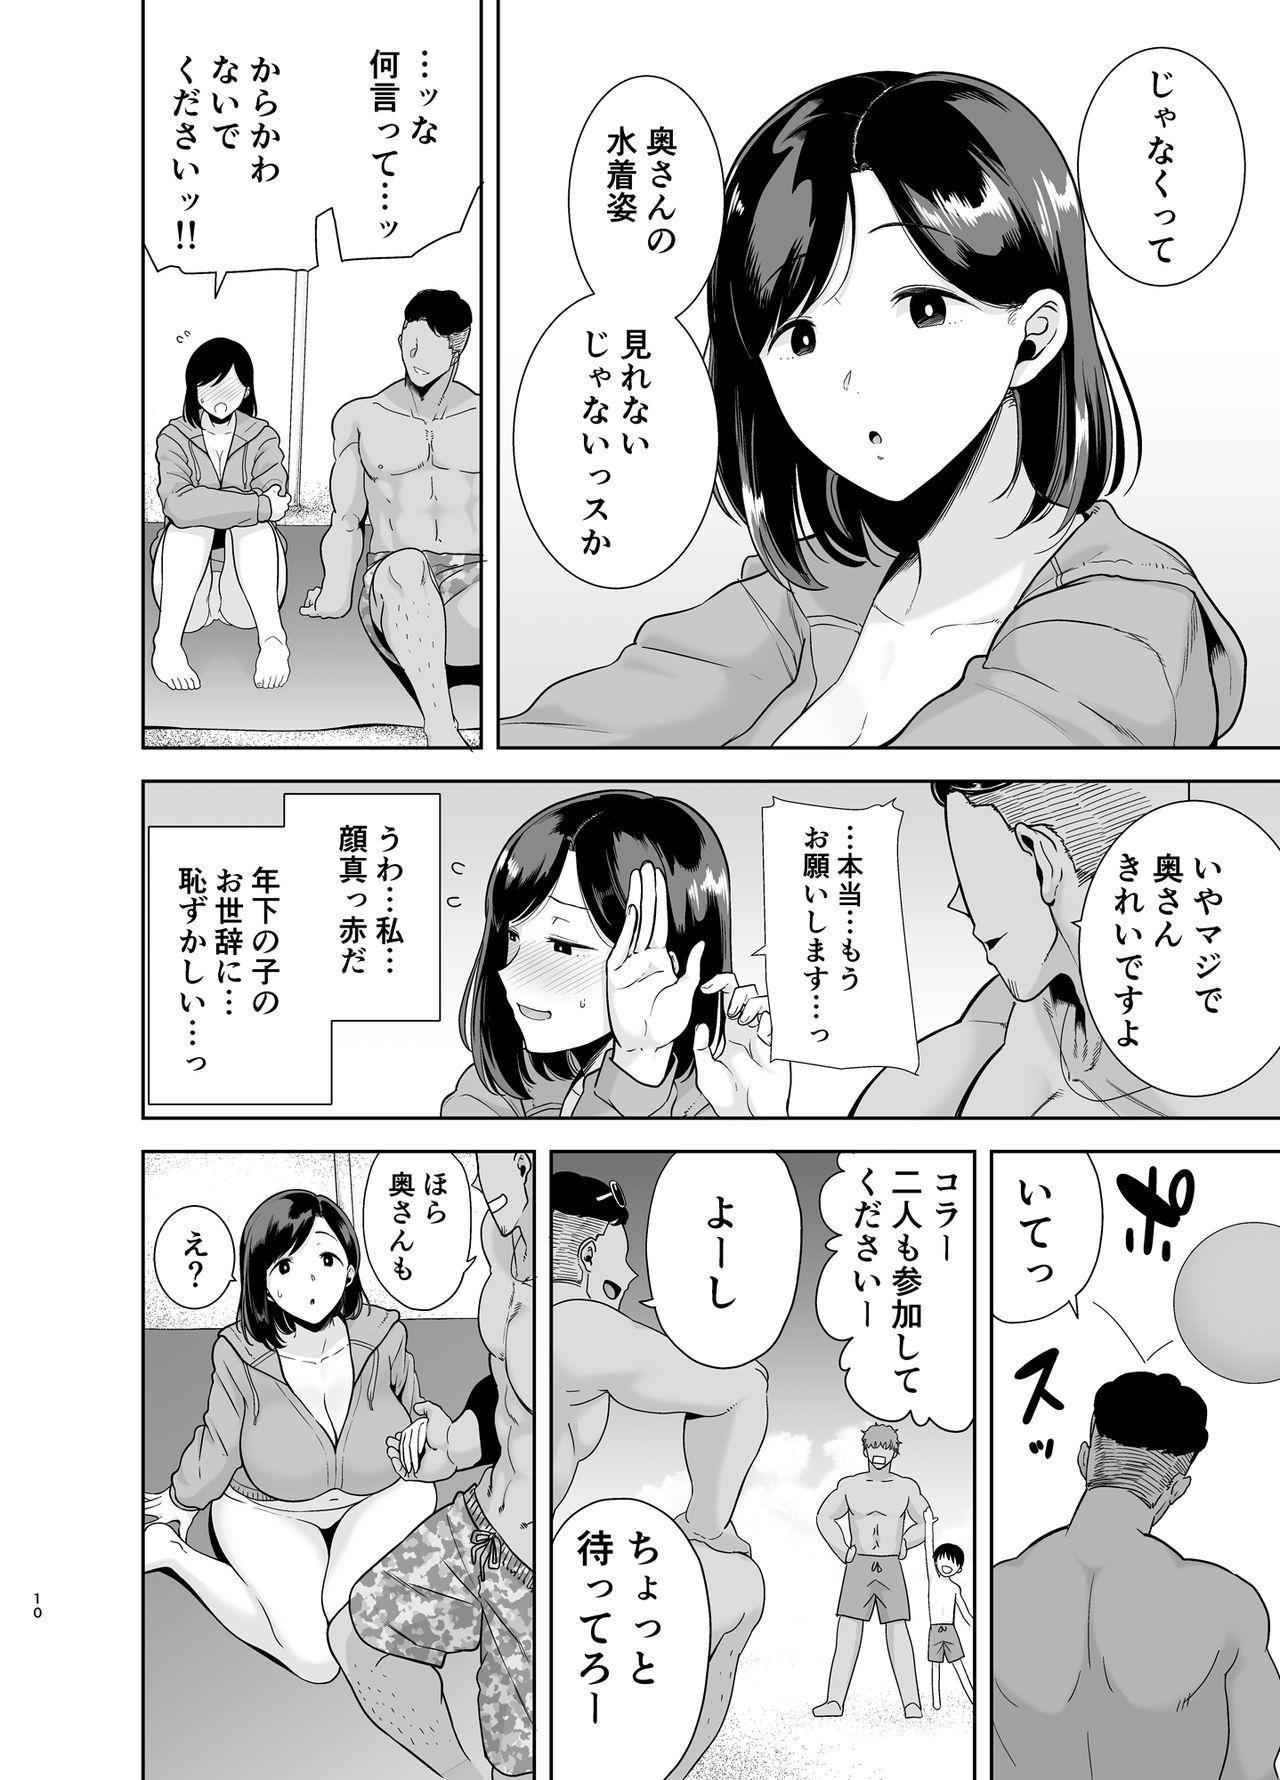 Natsuzuma 108